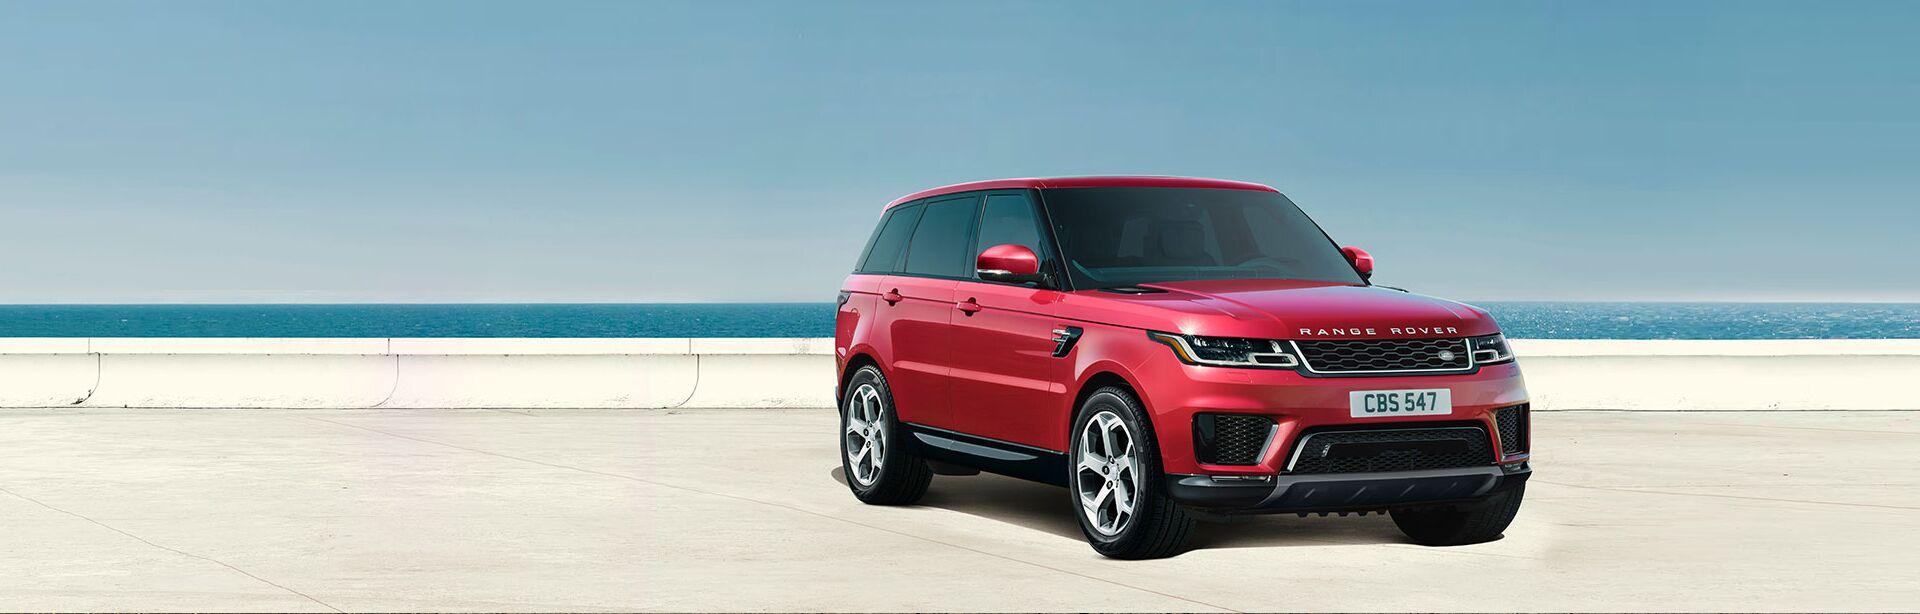 2021 Land Rover Range Rover Sport PHEV HSE Silver Edition